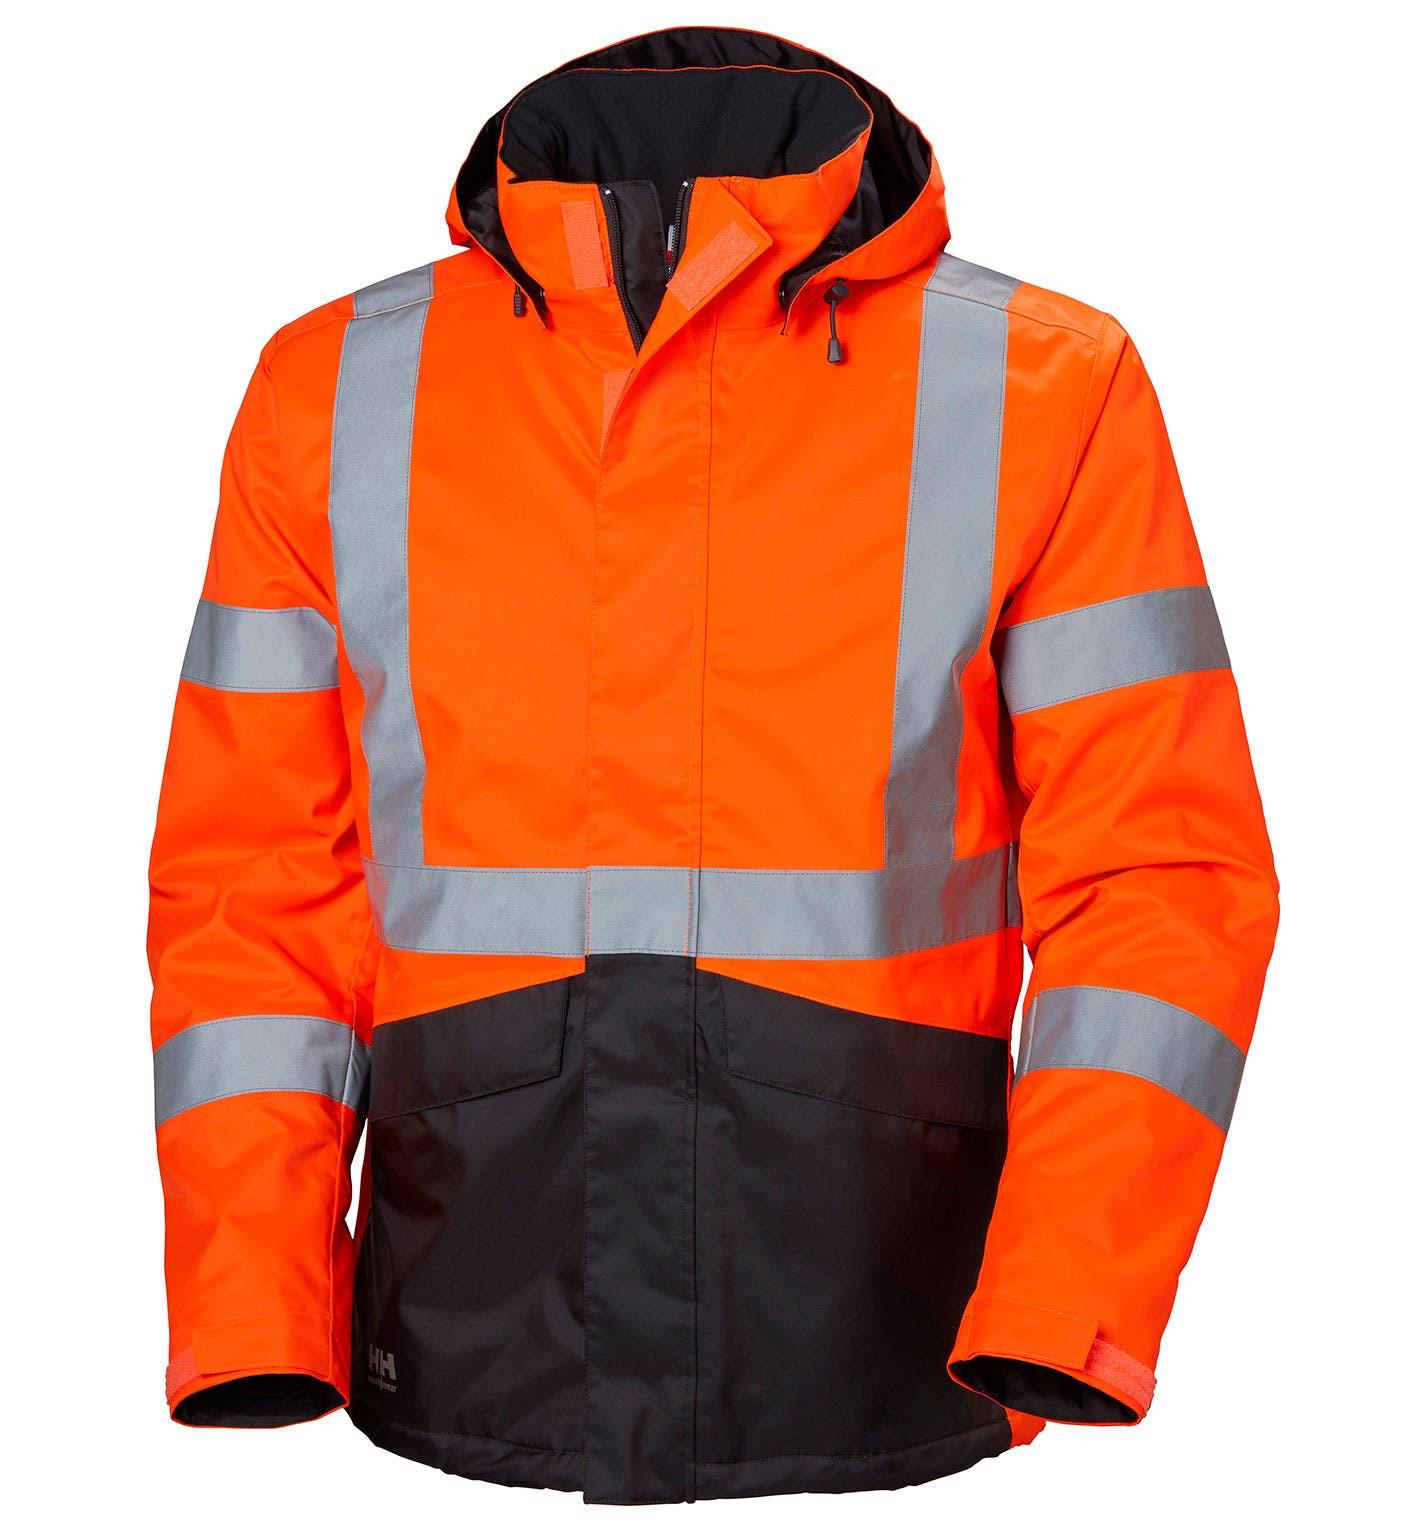 Куртка сигнальная Helly Hansen Alta Winter Jacket - 71332 (Orange/Ebony; M)